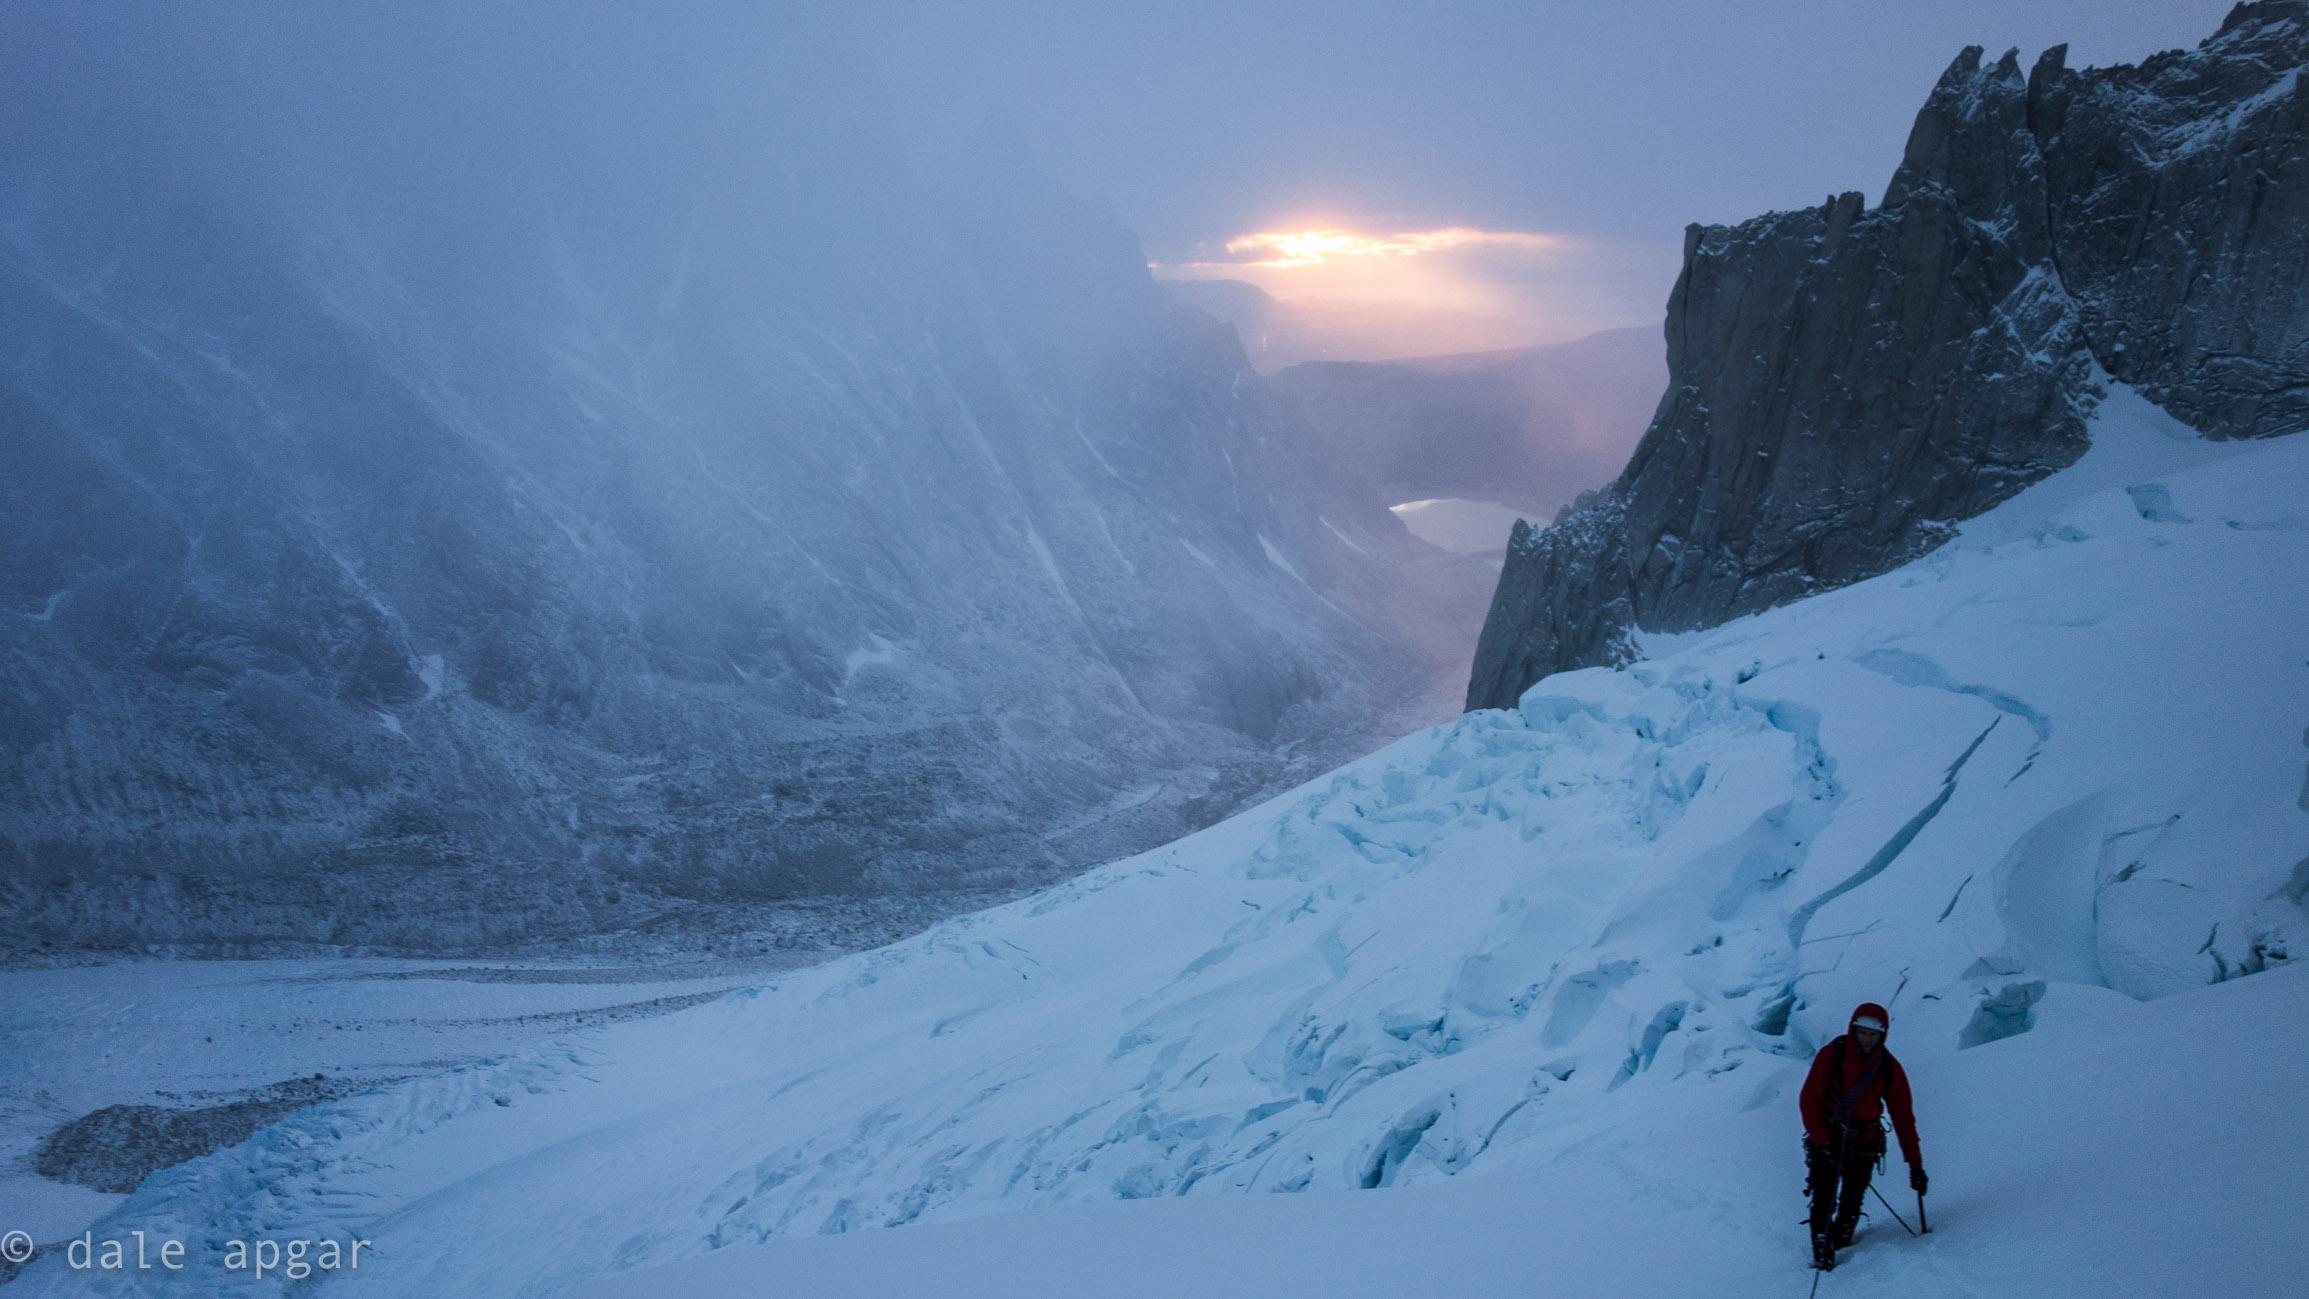 Crevasse danger behind us, avalanche threat ahead